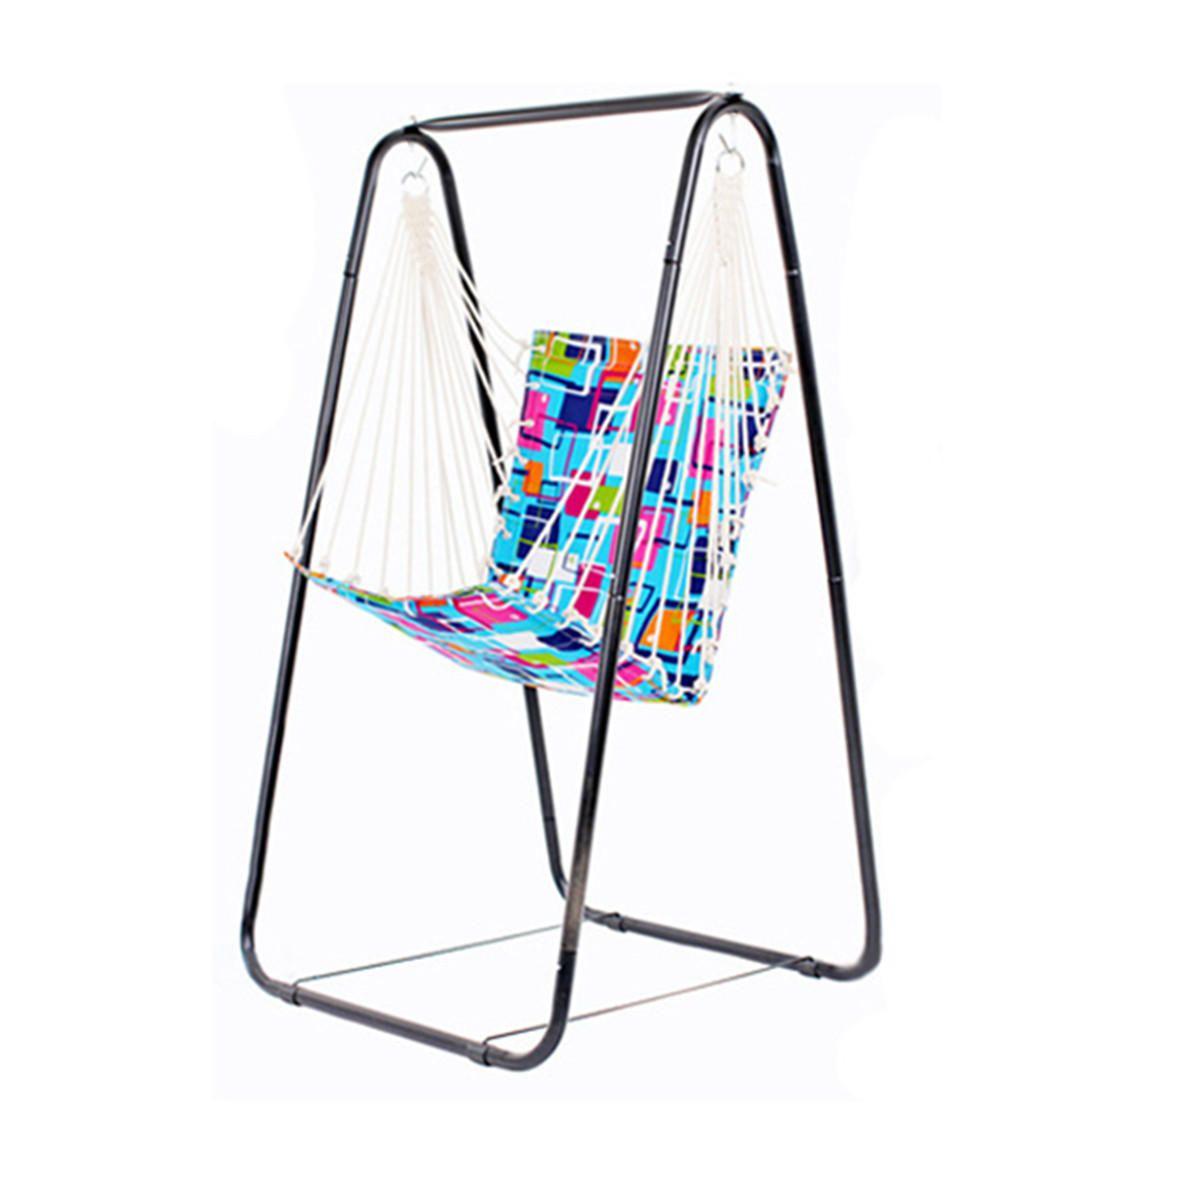 Hammock Hanging Chair Leisure Swing + Steel Foot Holder Garden Outdoor  Camping Hammock Swing Chair For Rest